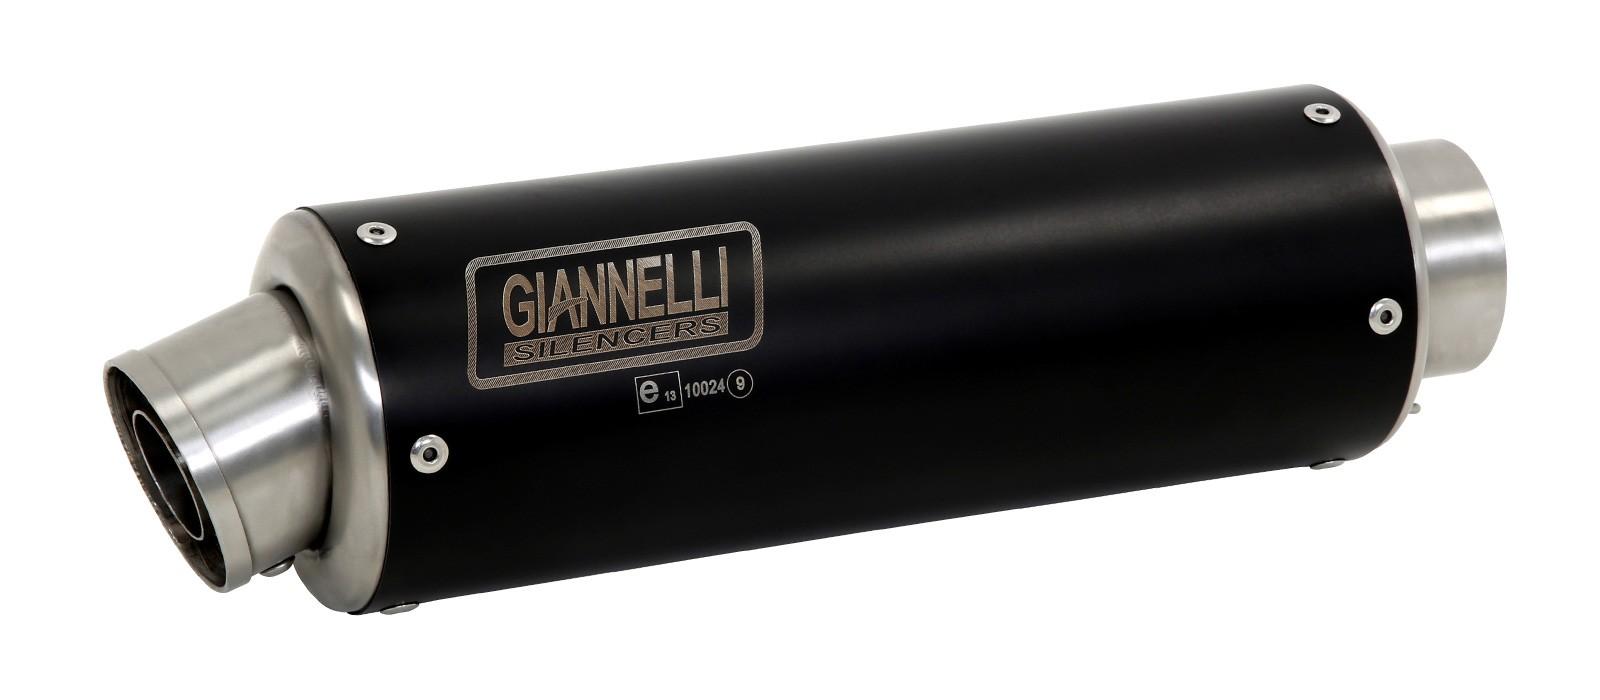 ESCAPES GIANNELLI YAMAHA - Slip-on nicrom X-PRO Yamaha YZF 600 R6 Giannelli 73533XPI -